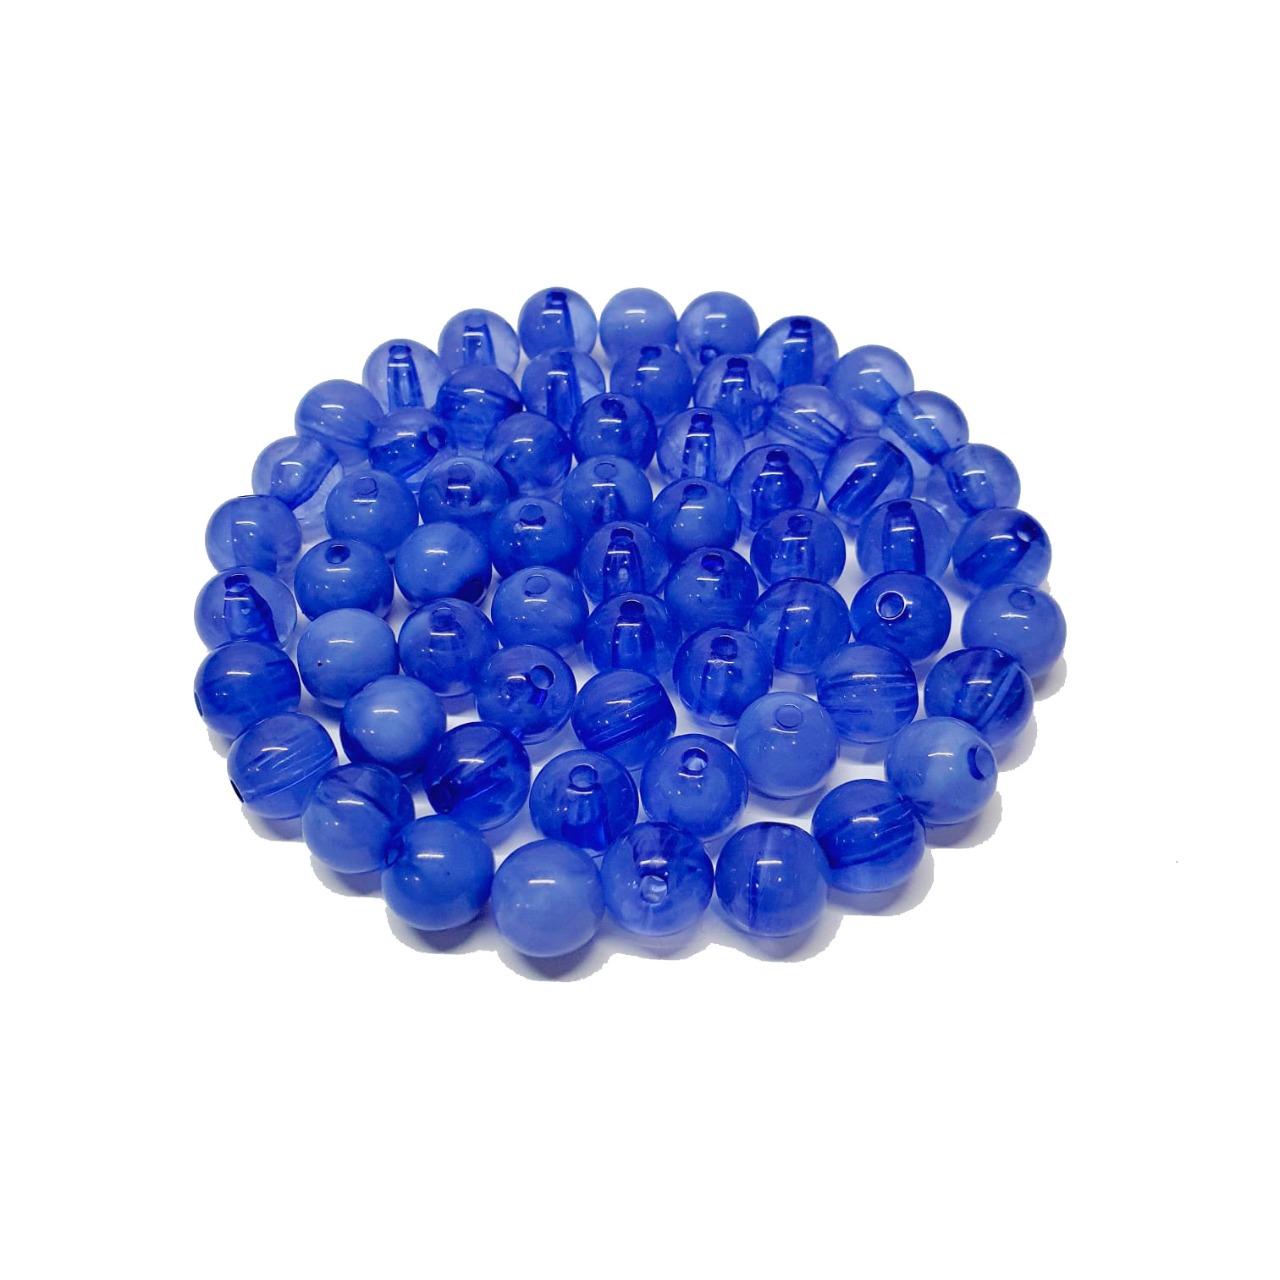 Bola de Resina Azul Royal Transparente